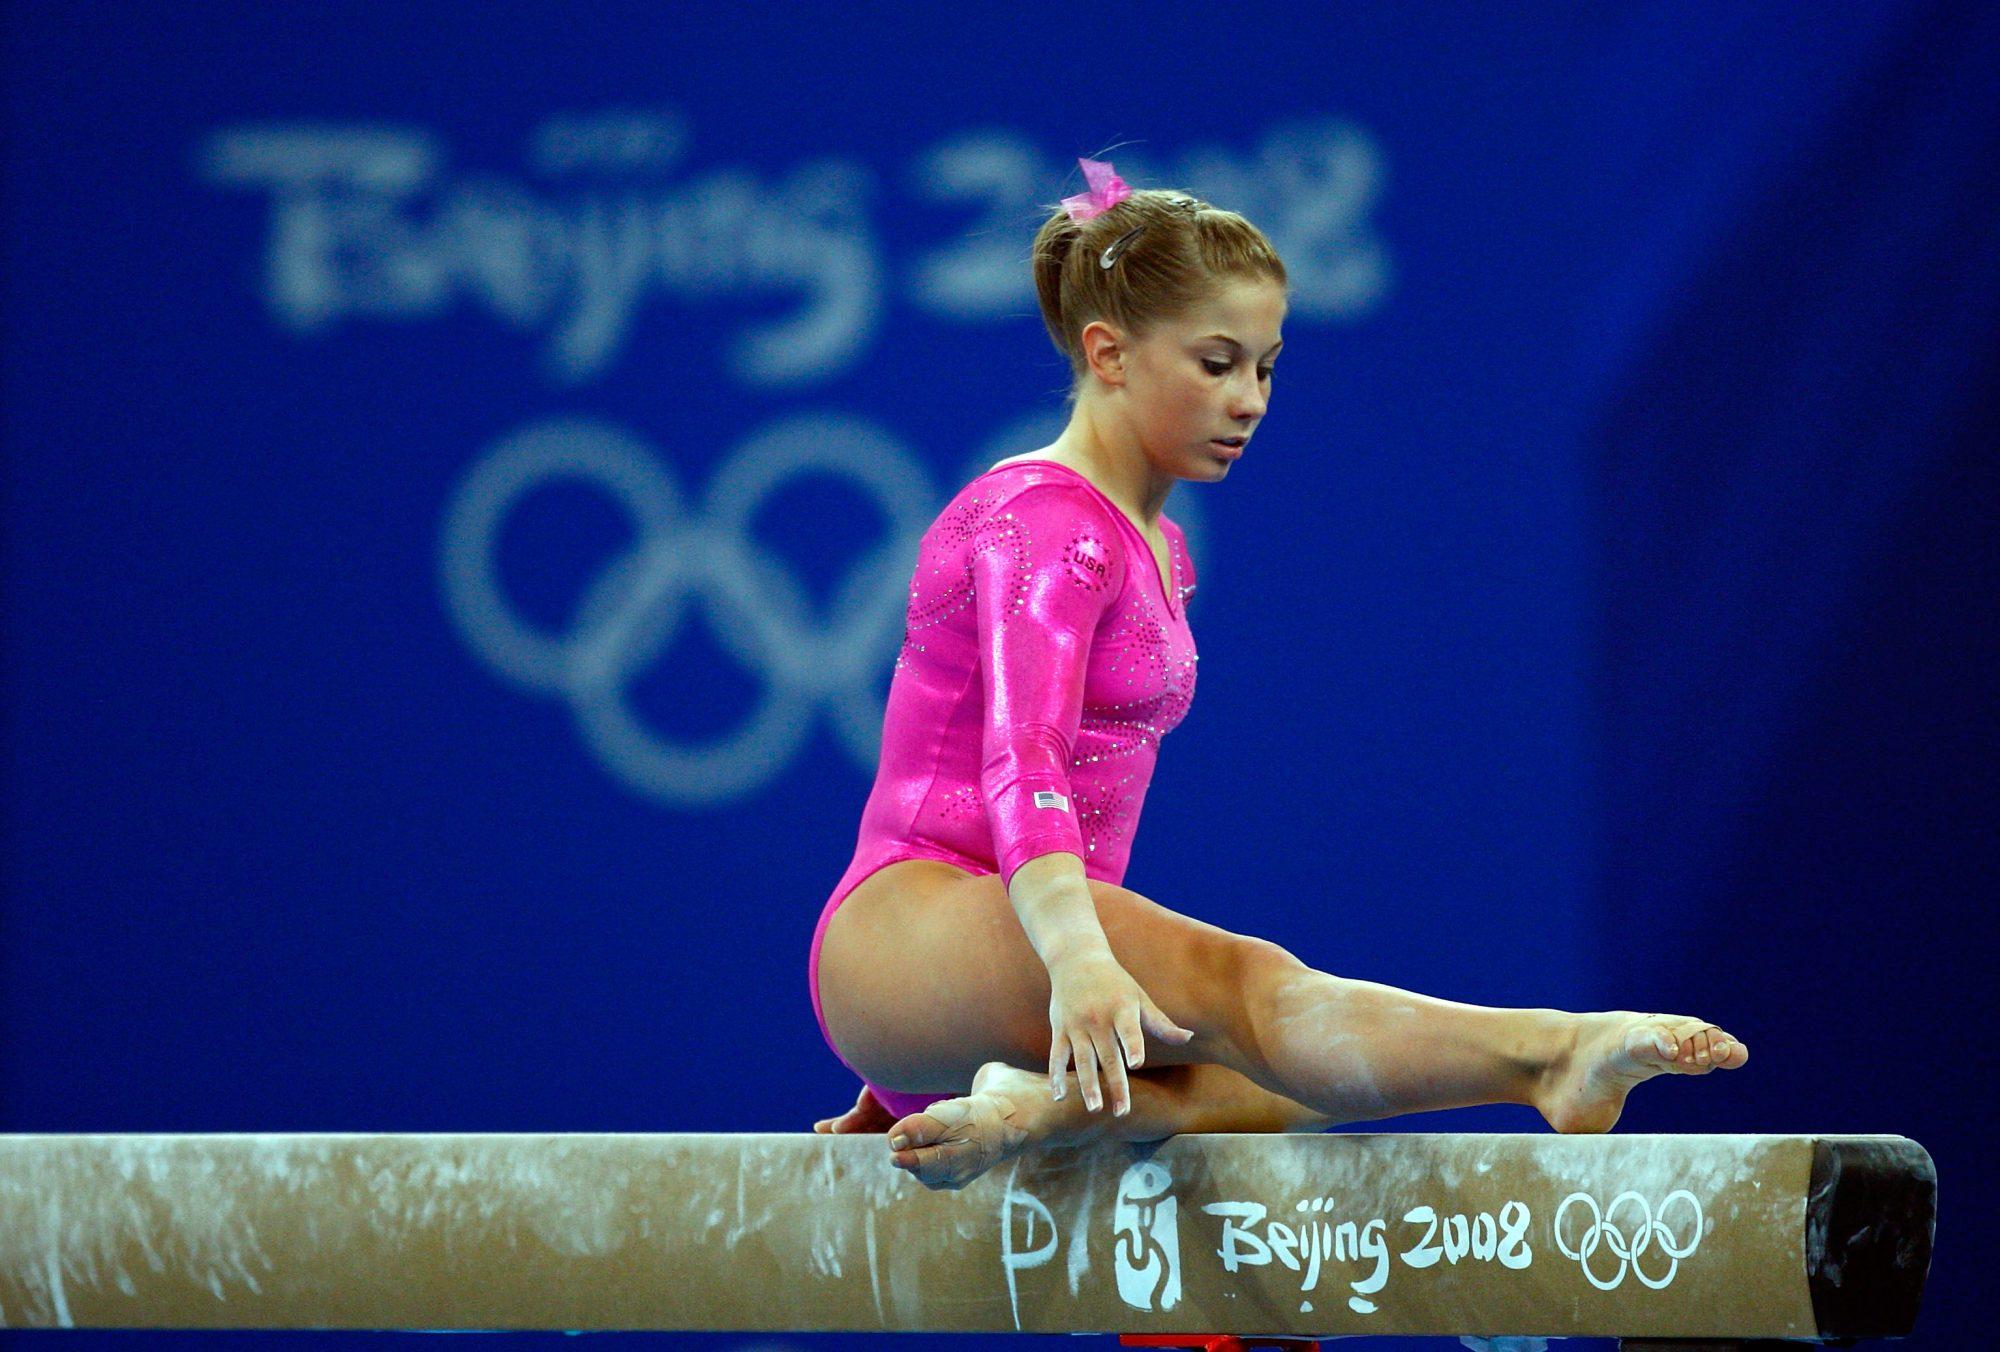 shawn-johnson-gymnast-beijing-2008